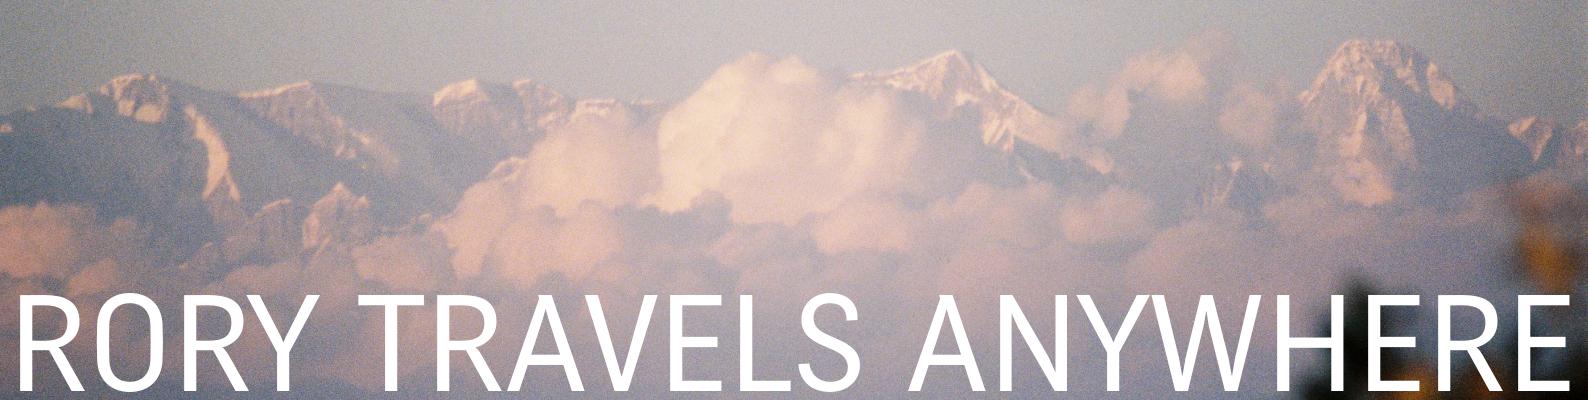 Vegan Traveler Blog - Rory Travels - Vegan Travel